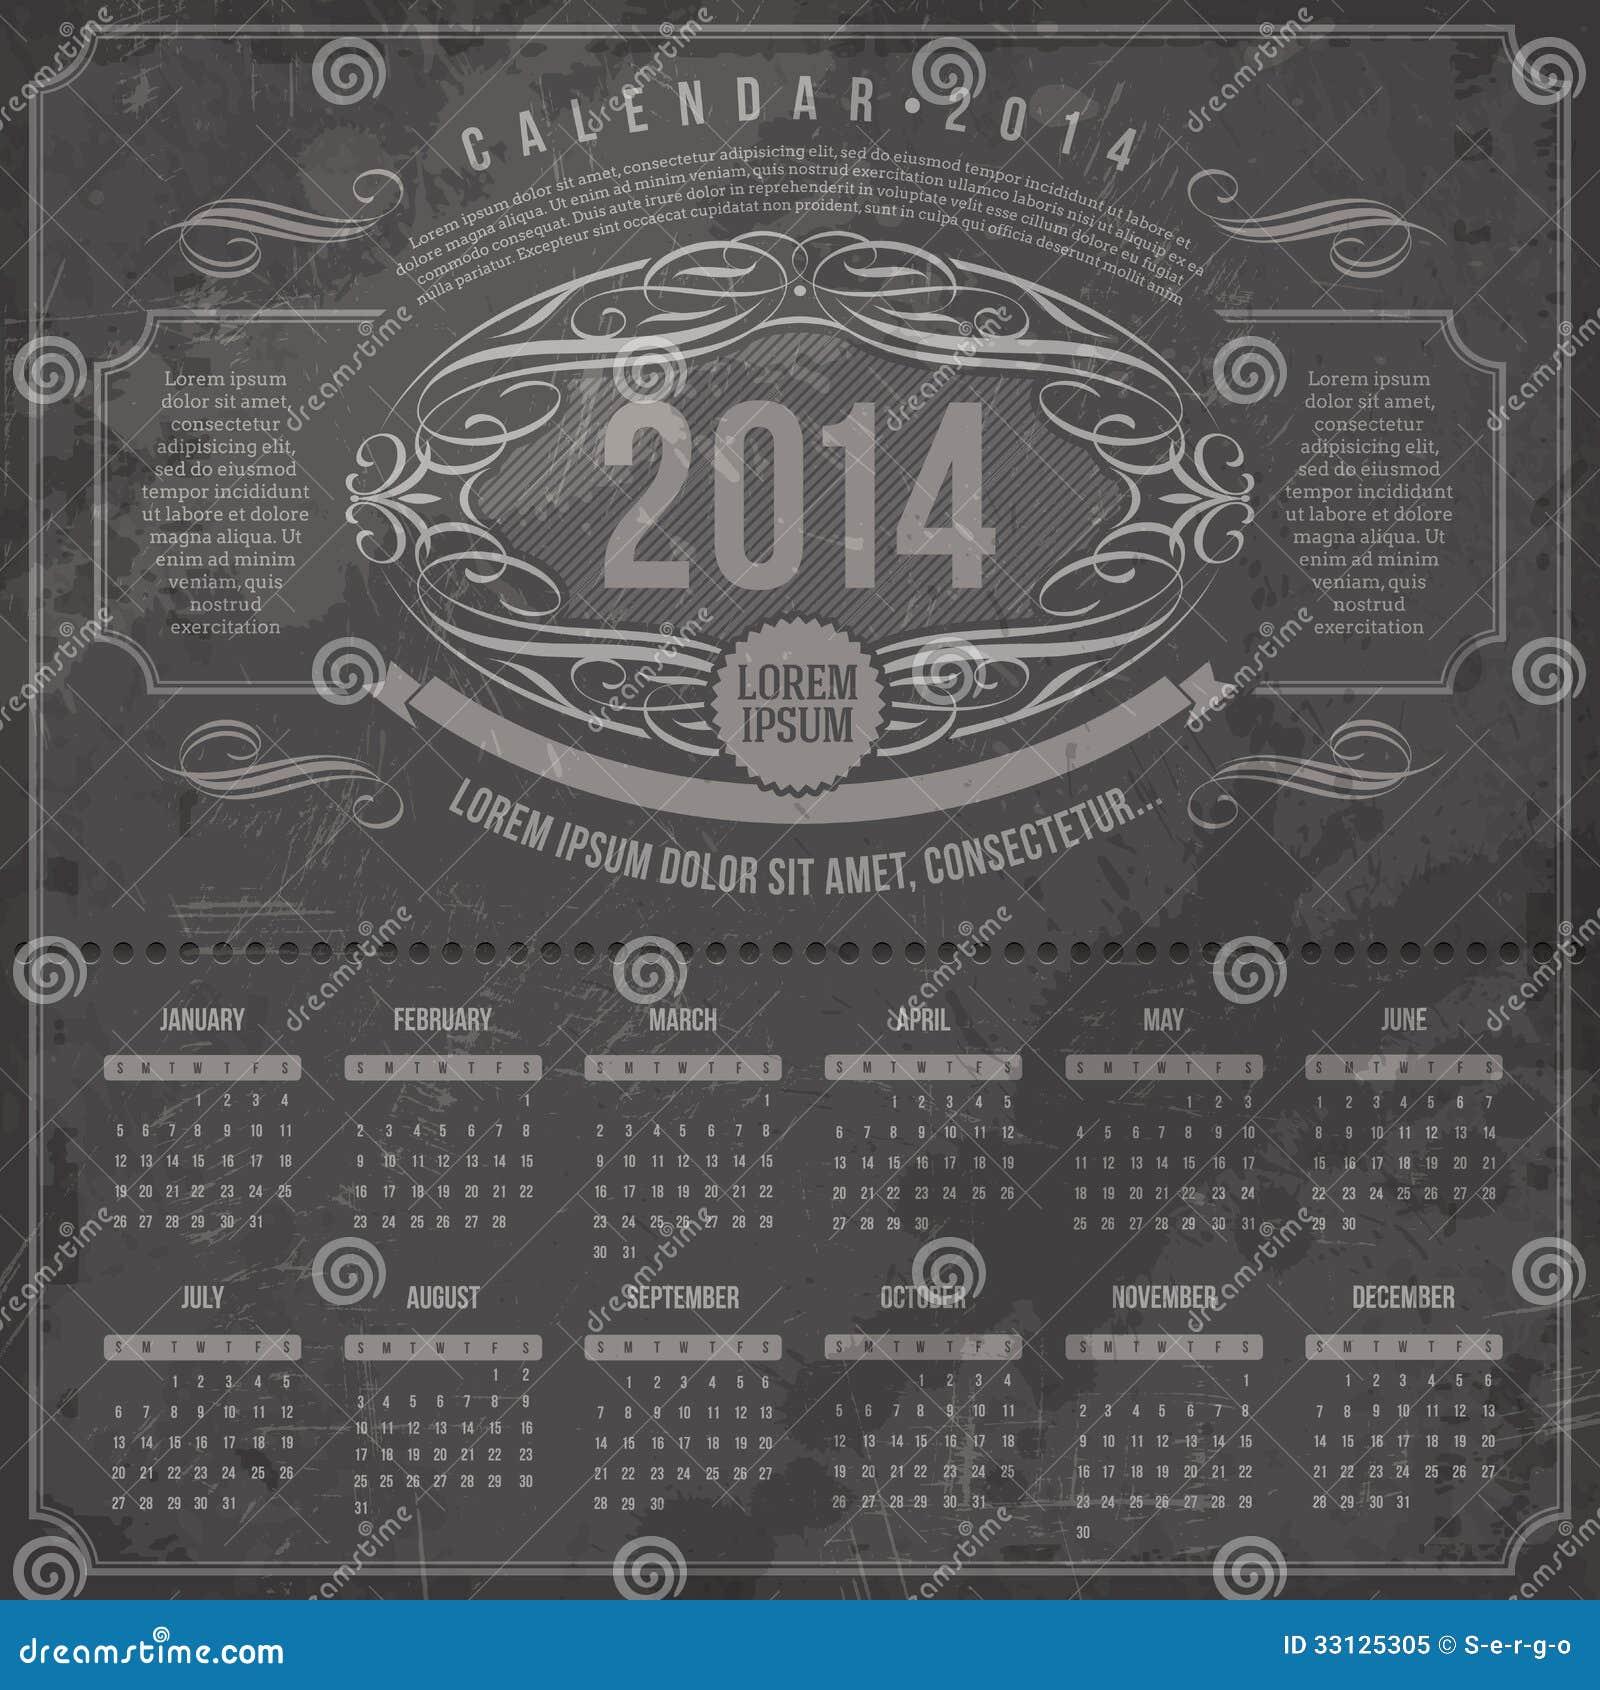 Vintage Calendar Template : Ornate vintage calendar of royalty free stock photo